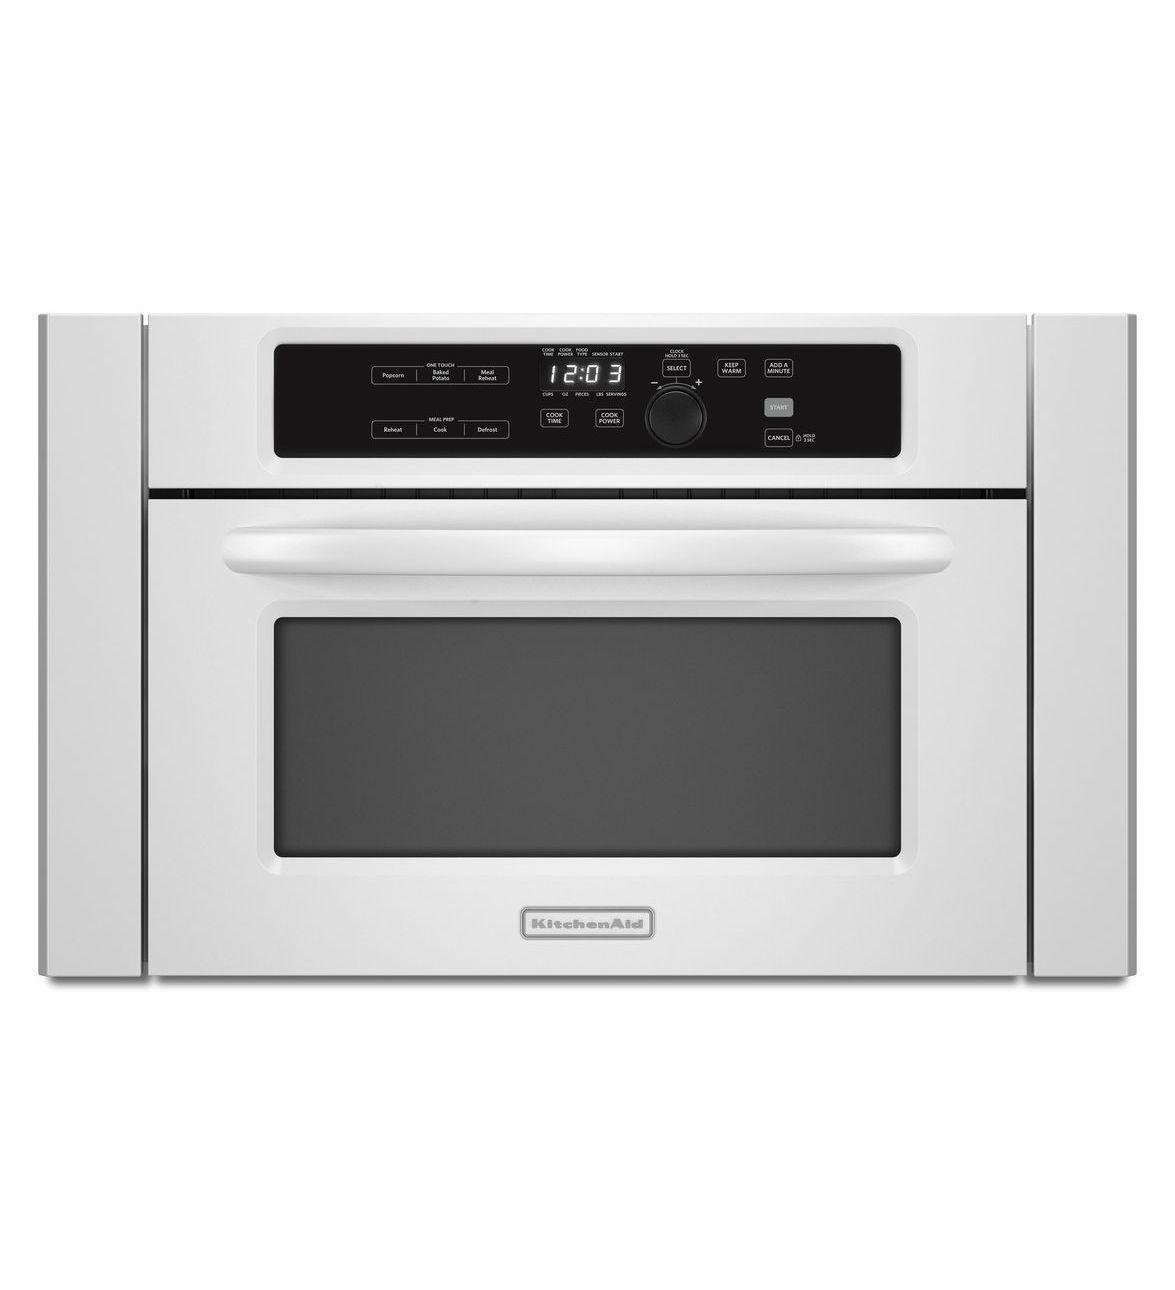 Kitchenaid 24 1000watt builtin microwave architect